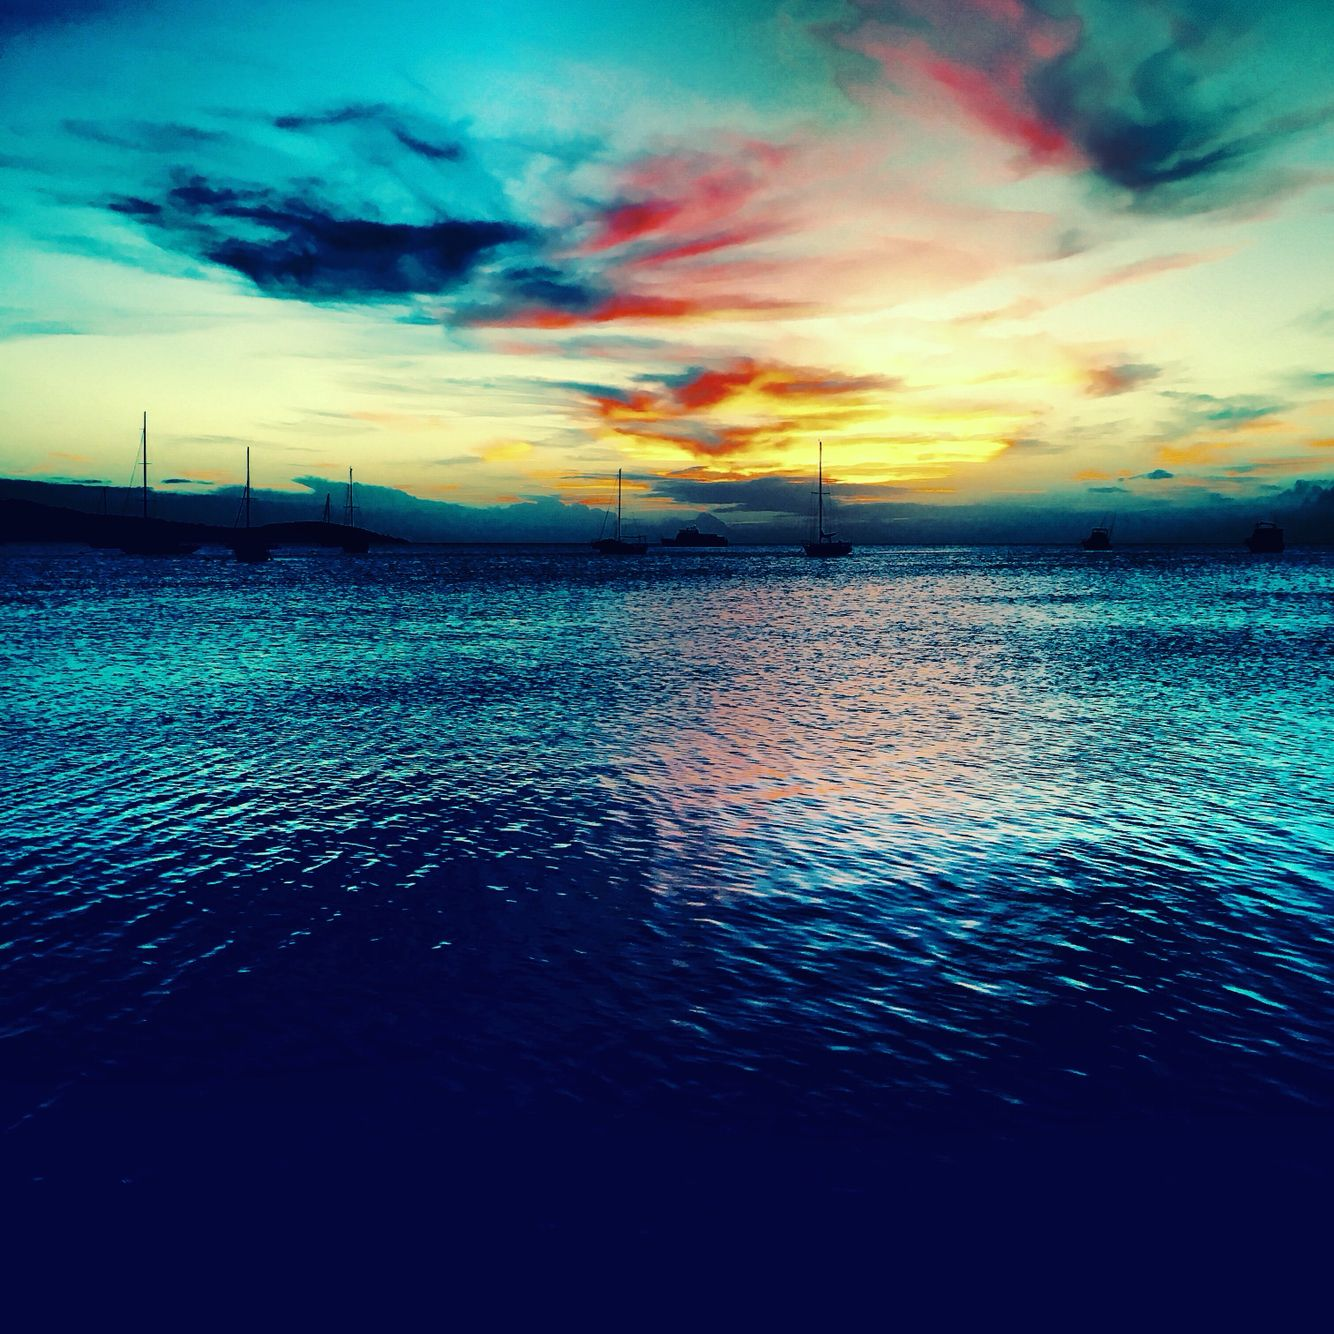 Sunset in Puerto rico By J. Reaper  Instagram @blacklotuspr